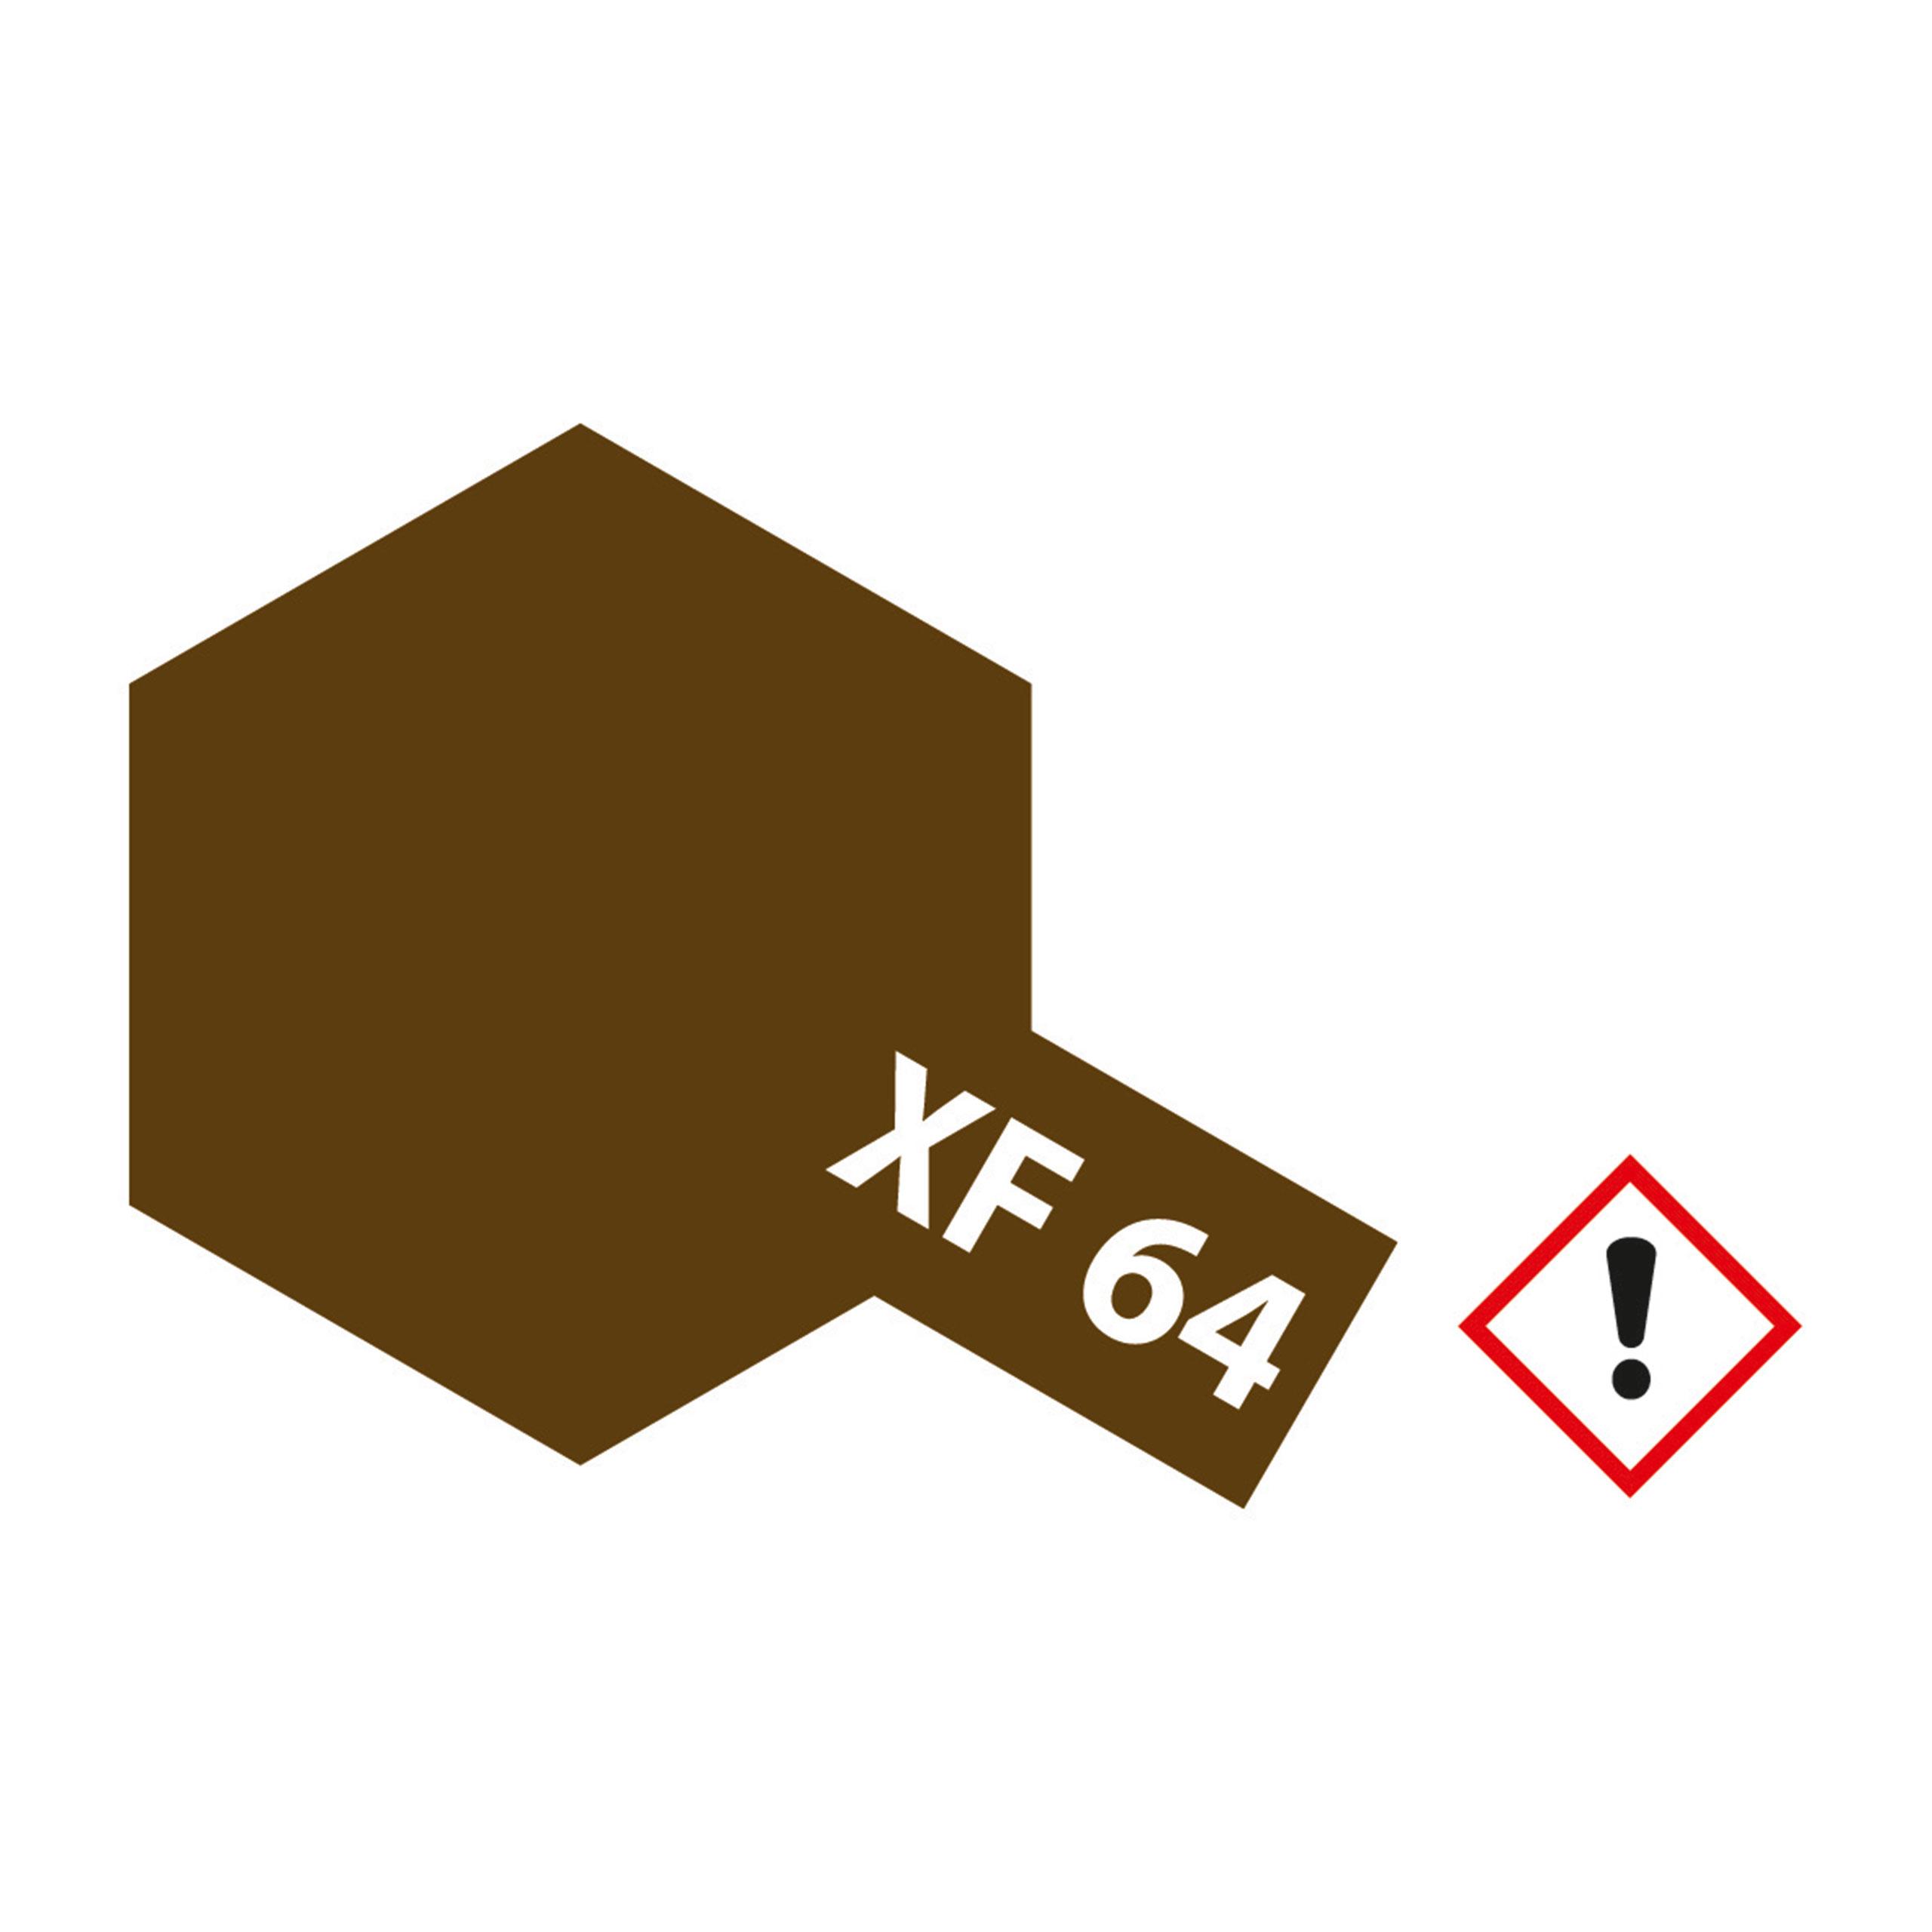 XF-64 Rot Braun matt - 23ml Acrylstreichfarbe wasserloeslich Tamiya 300081364